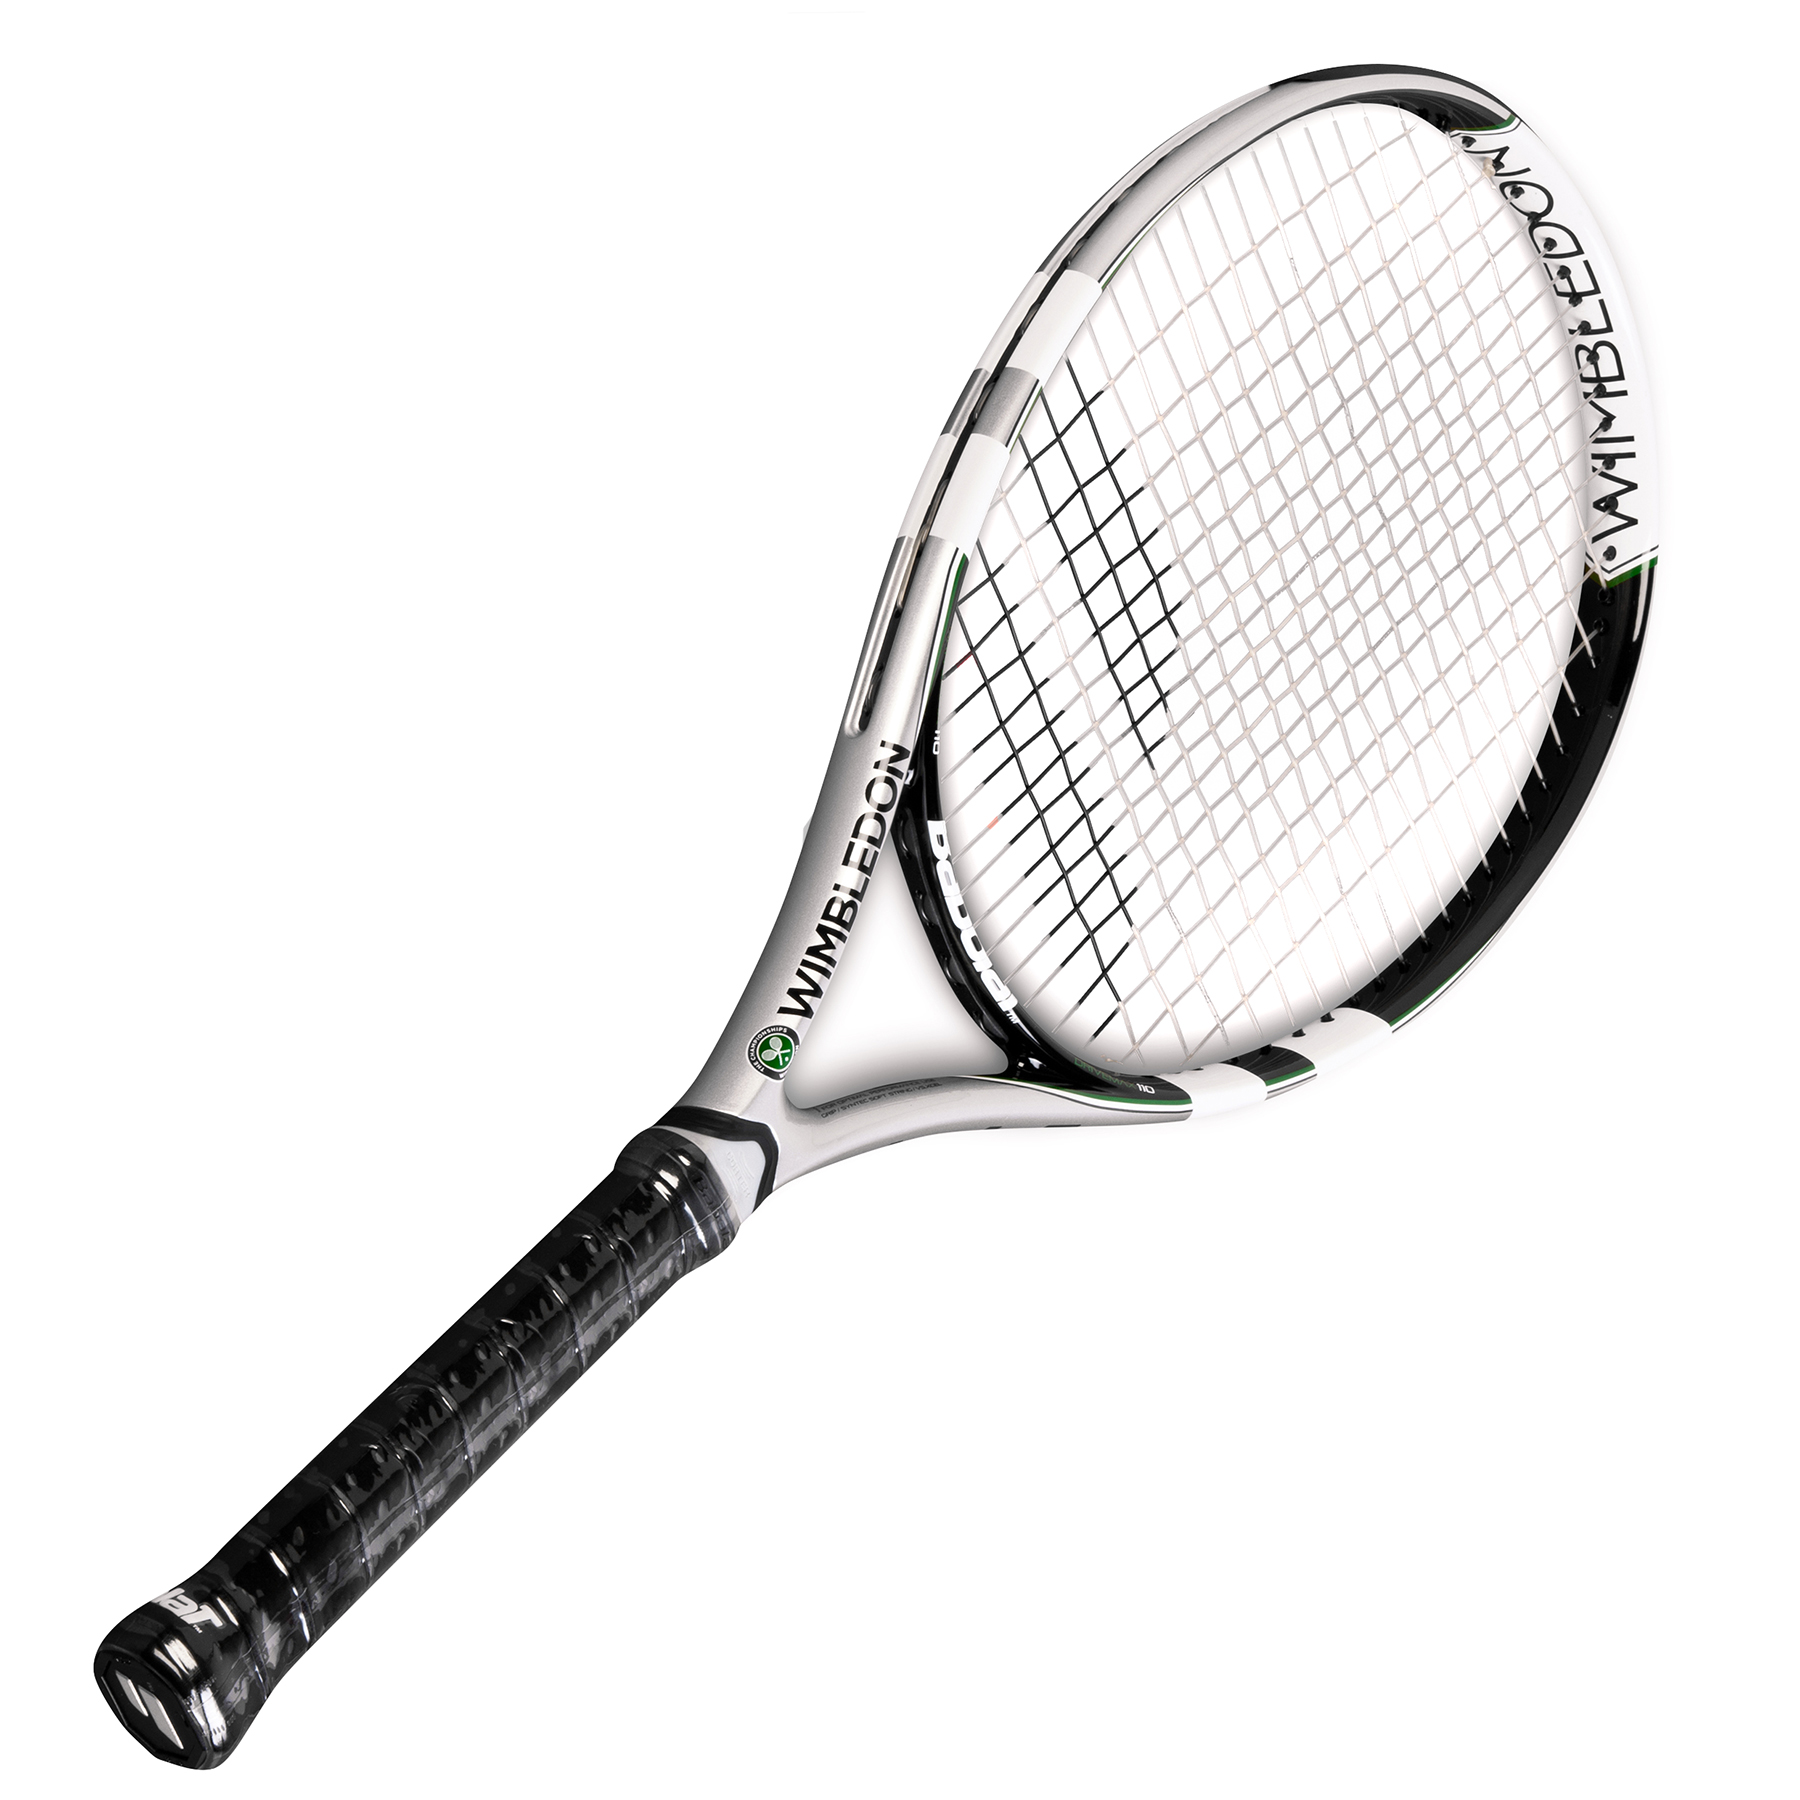 Wimbledon Drive Max 110 Racket Grey